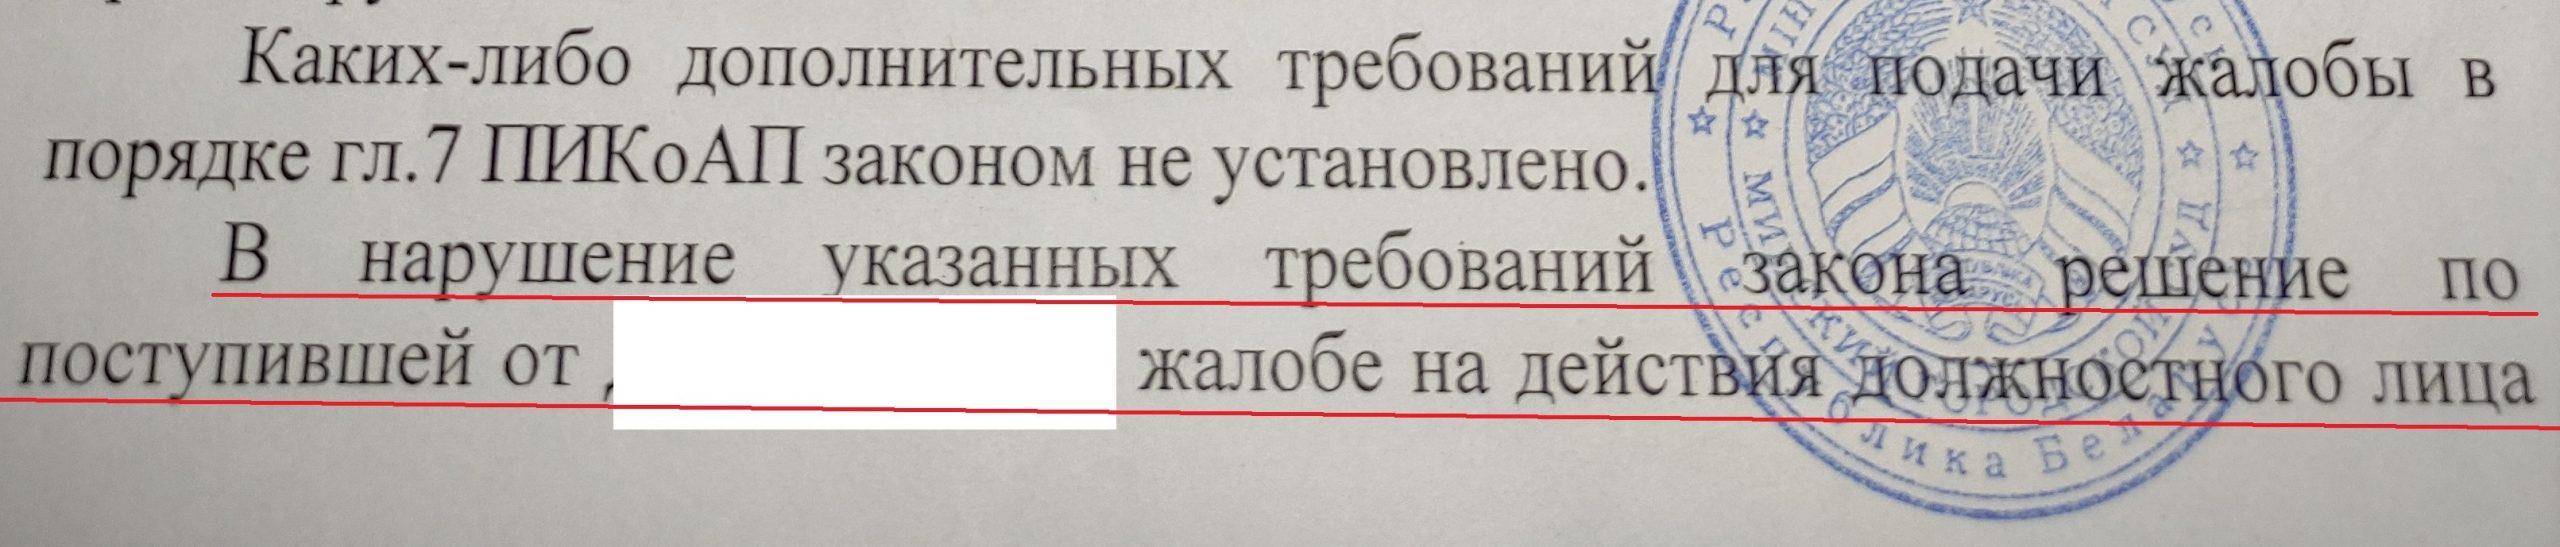 Мингорсуд - отмена постановленияч.10 ст.18.14 КоАП